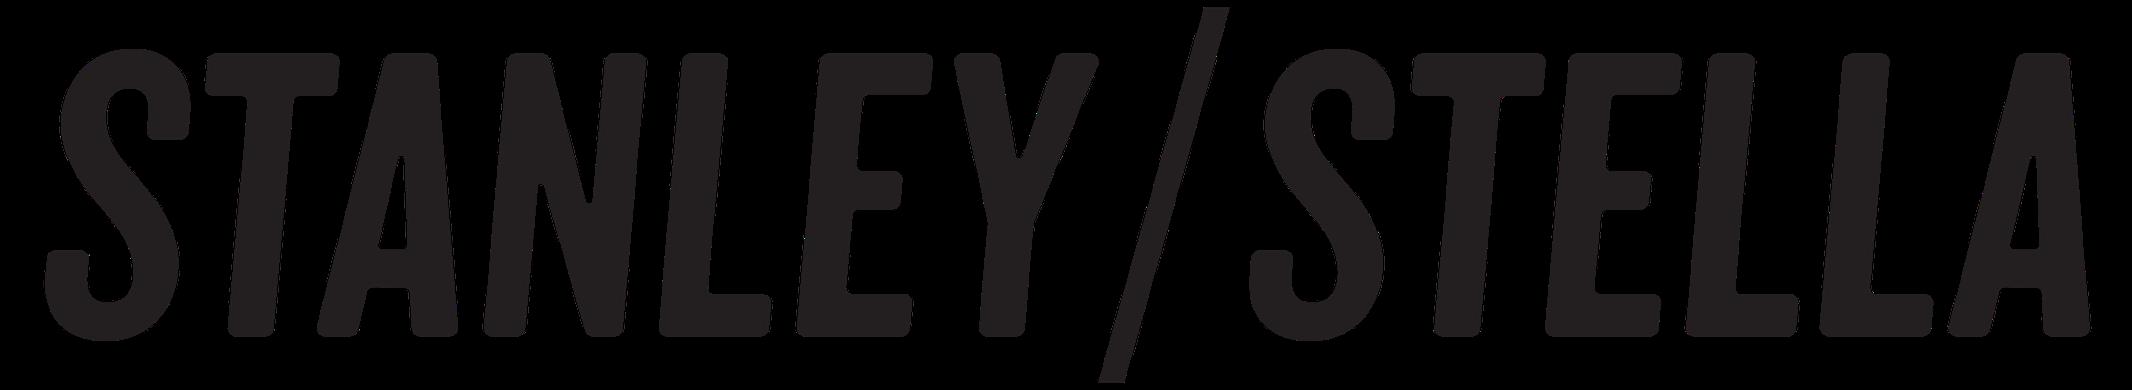 Logo Stanley/Stella